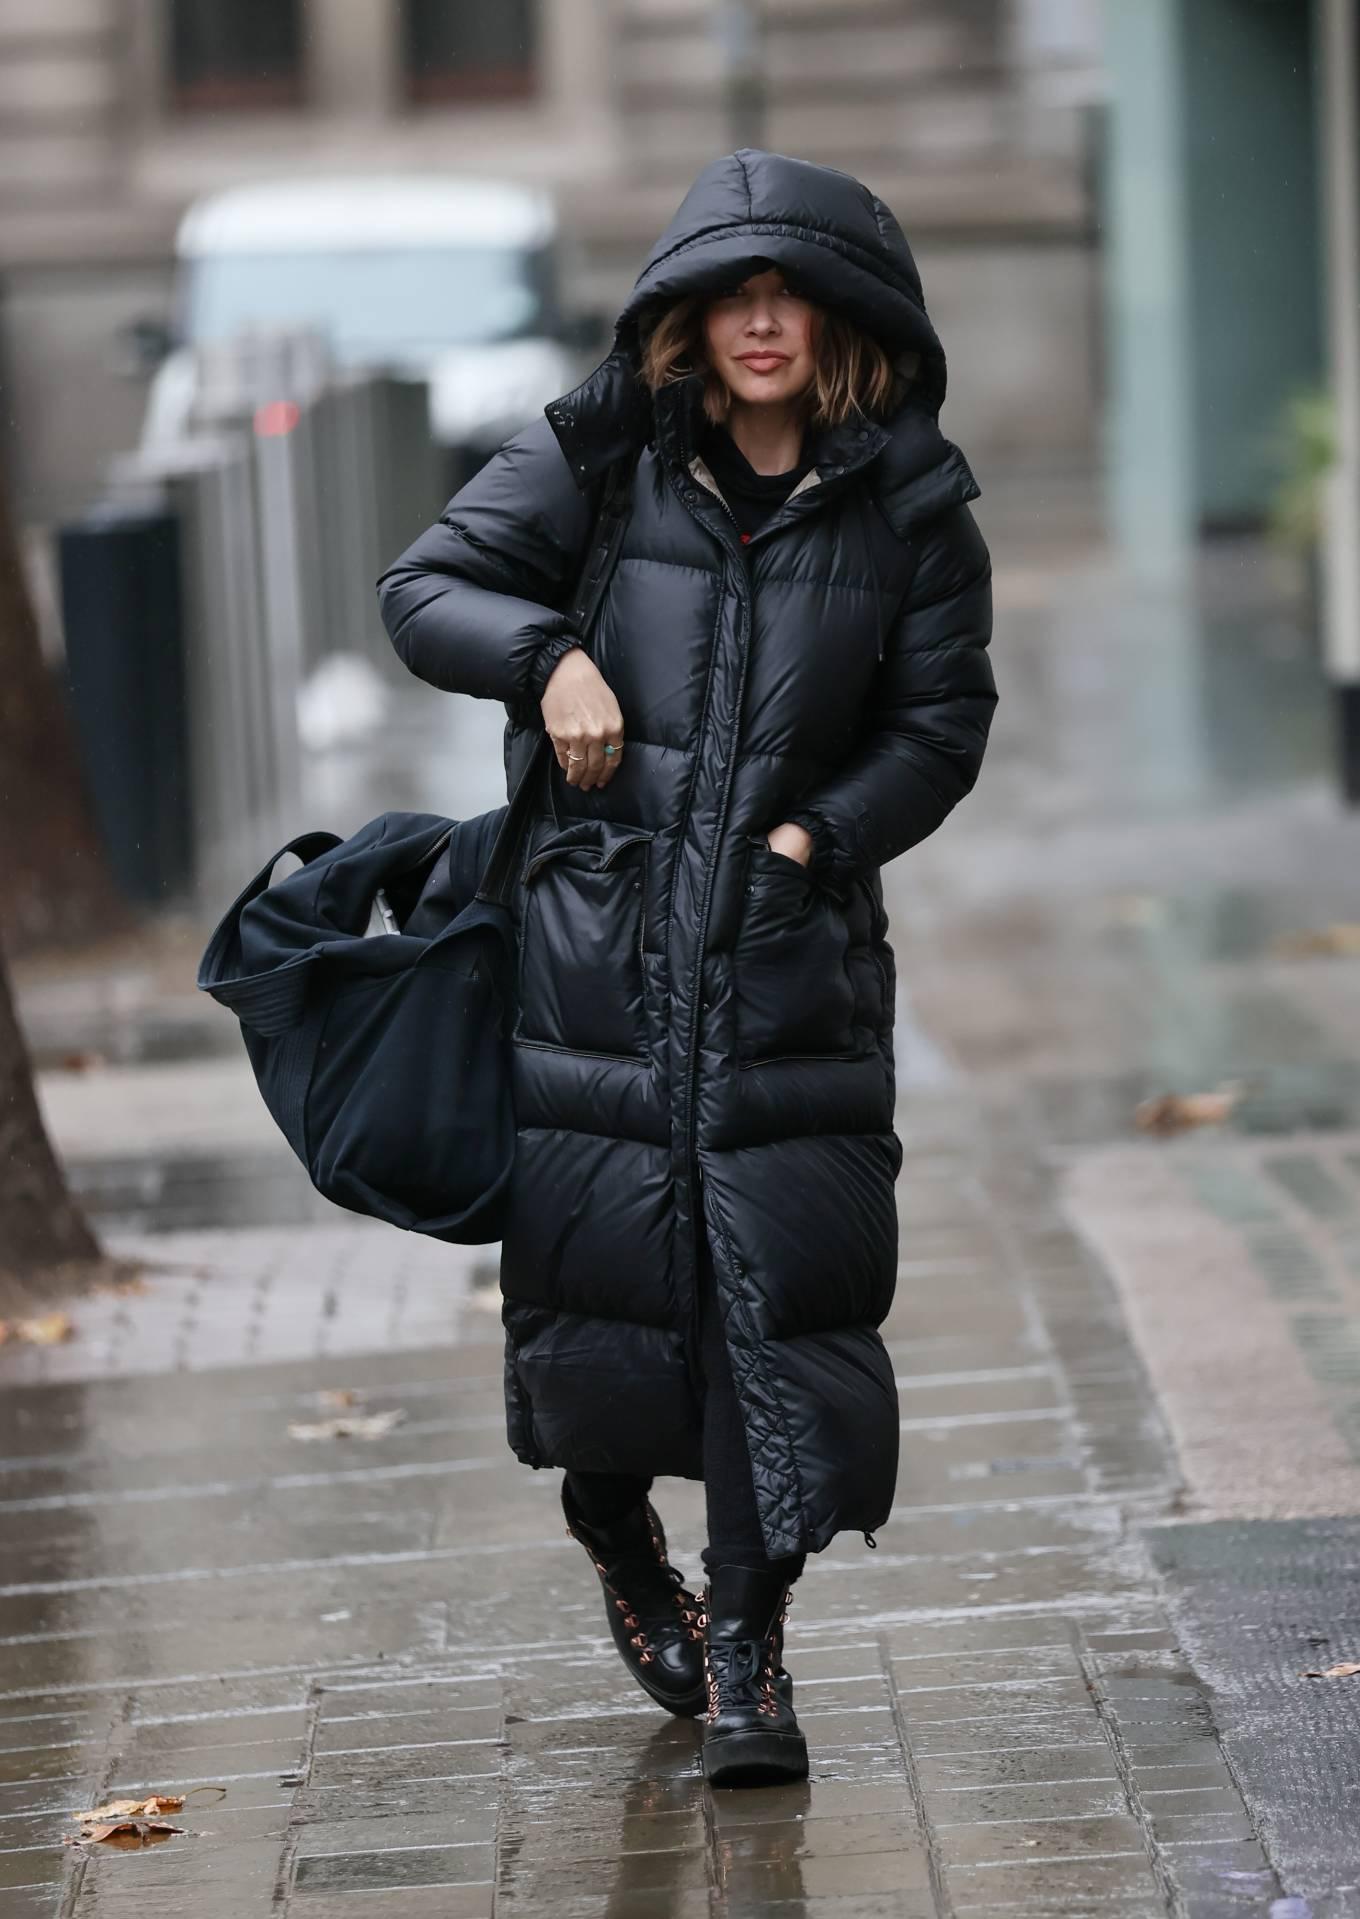 Myleene Klass 2020 : Myleene Klass – In a warm coat arriving at Smooth radio in London-06